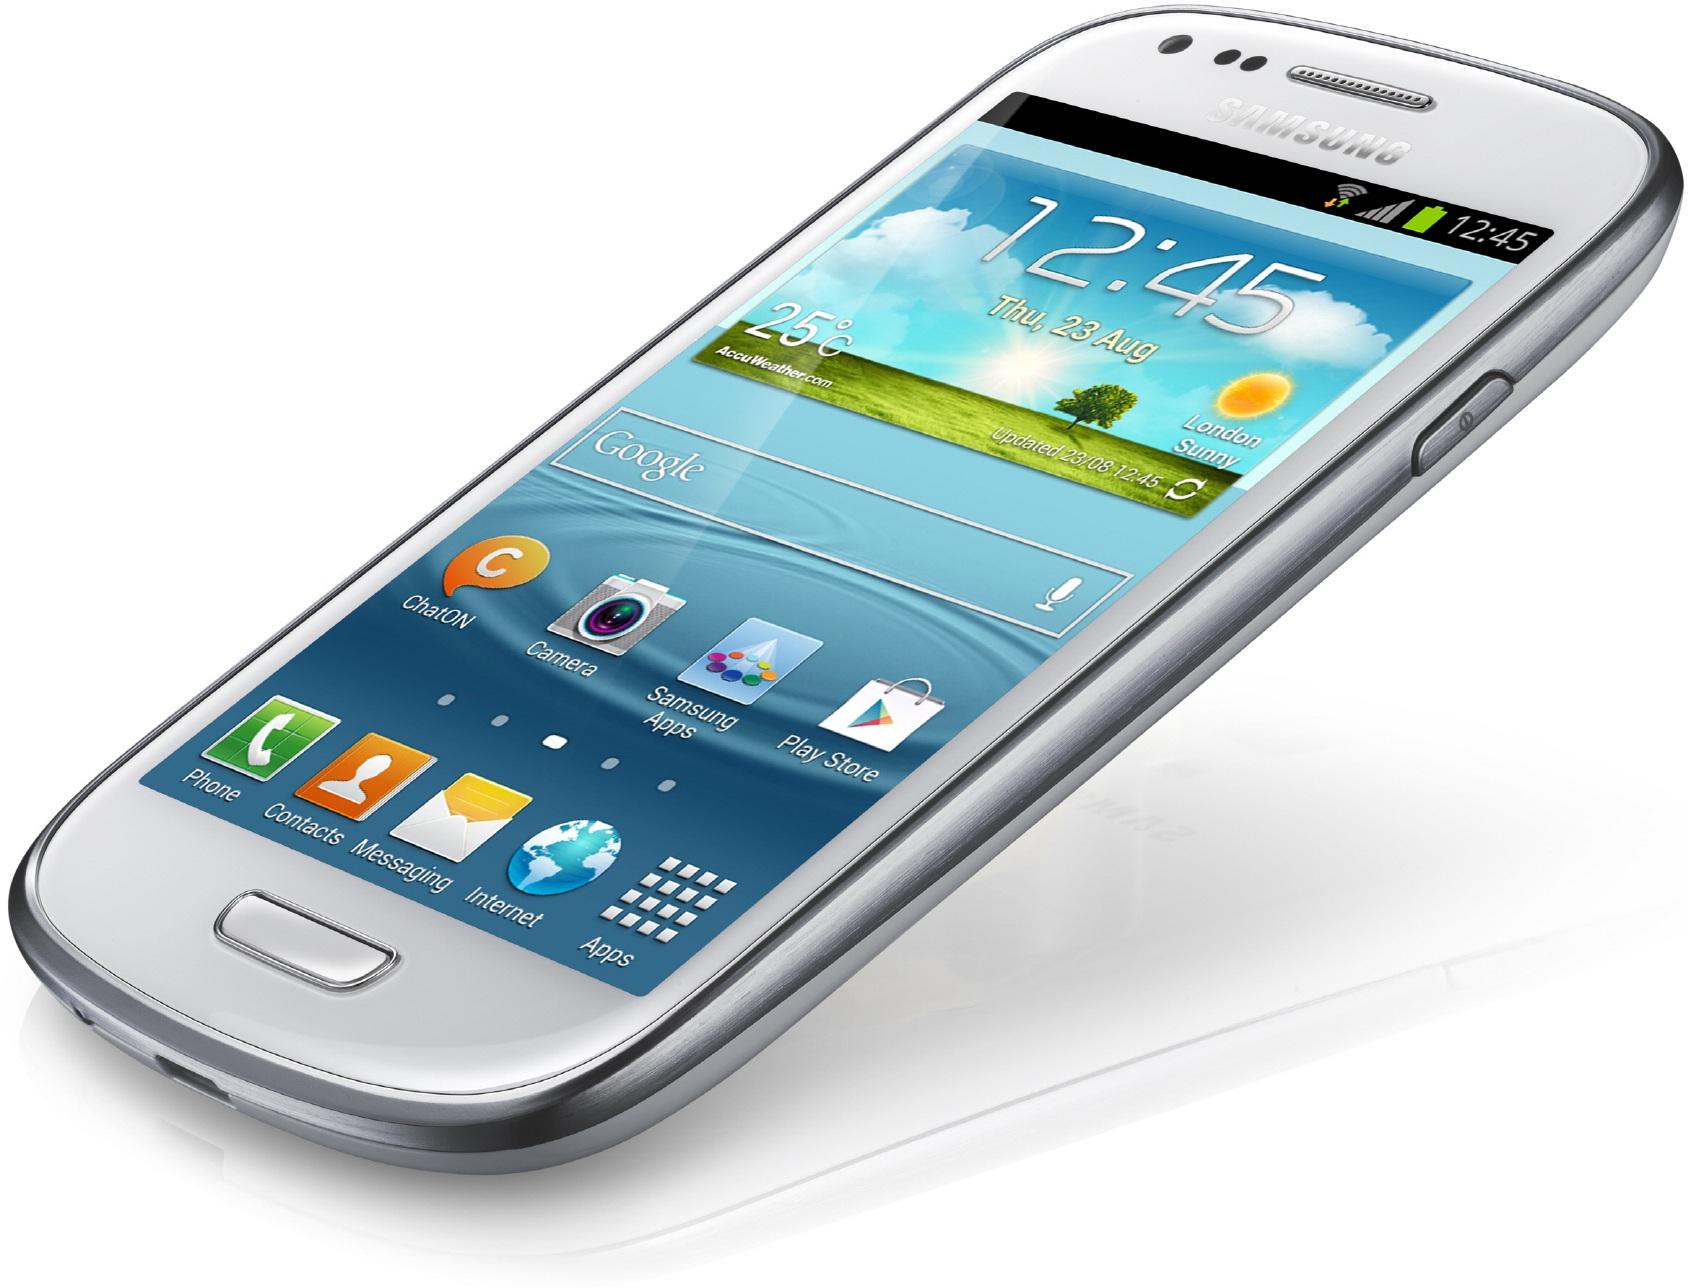 Samsung Galaxy S3 Mini Produktbild